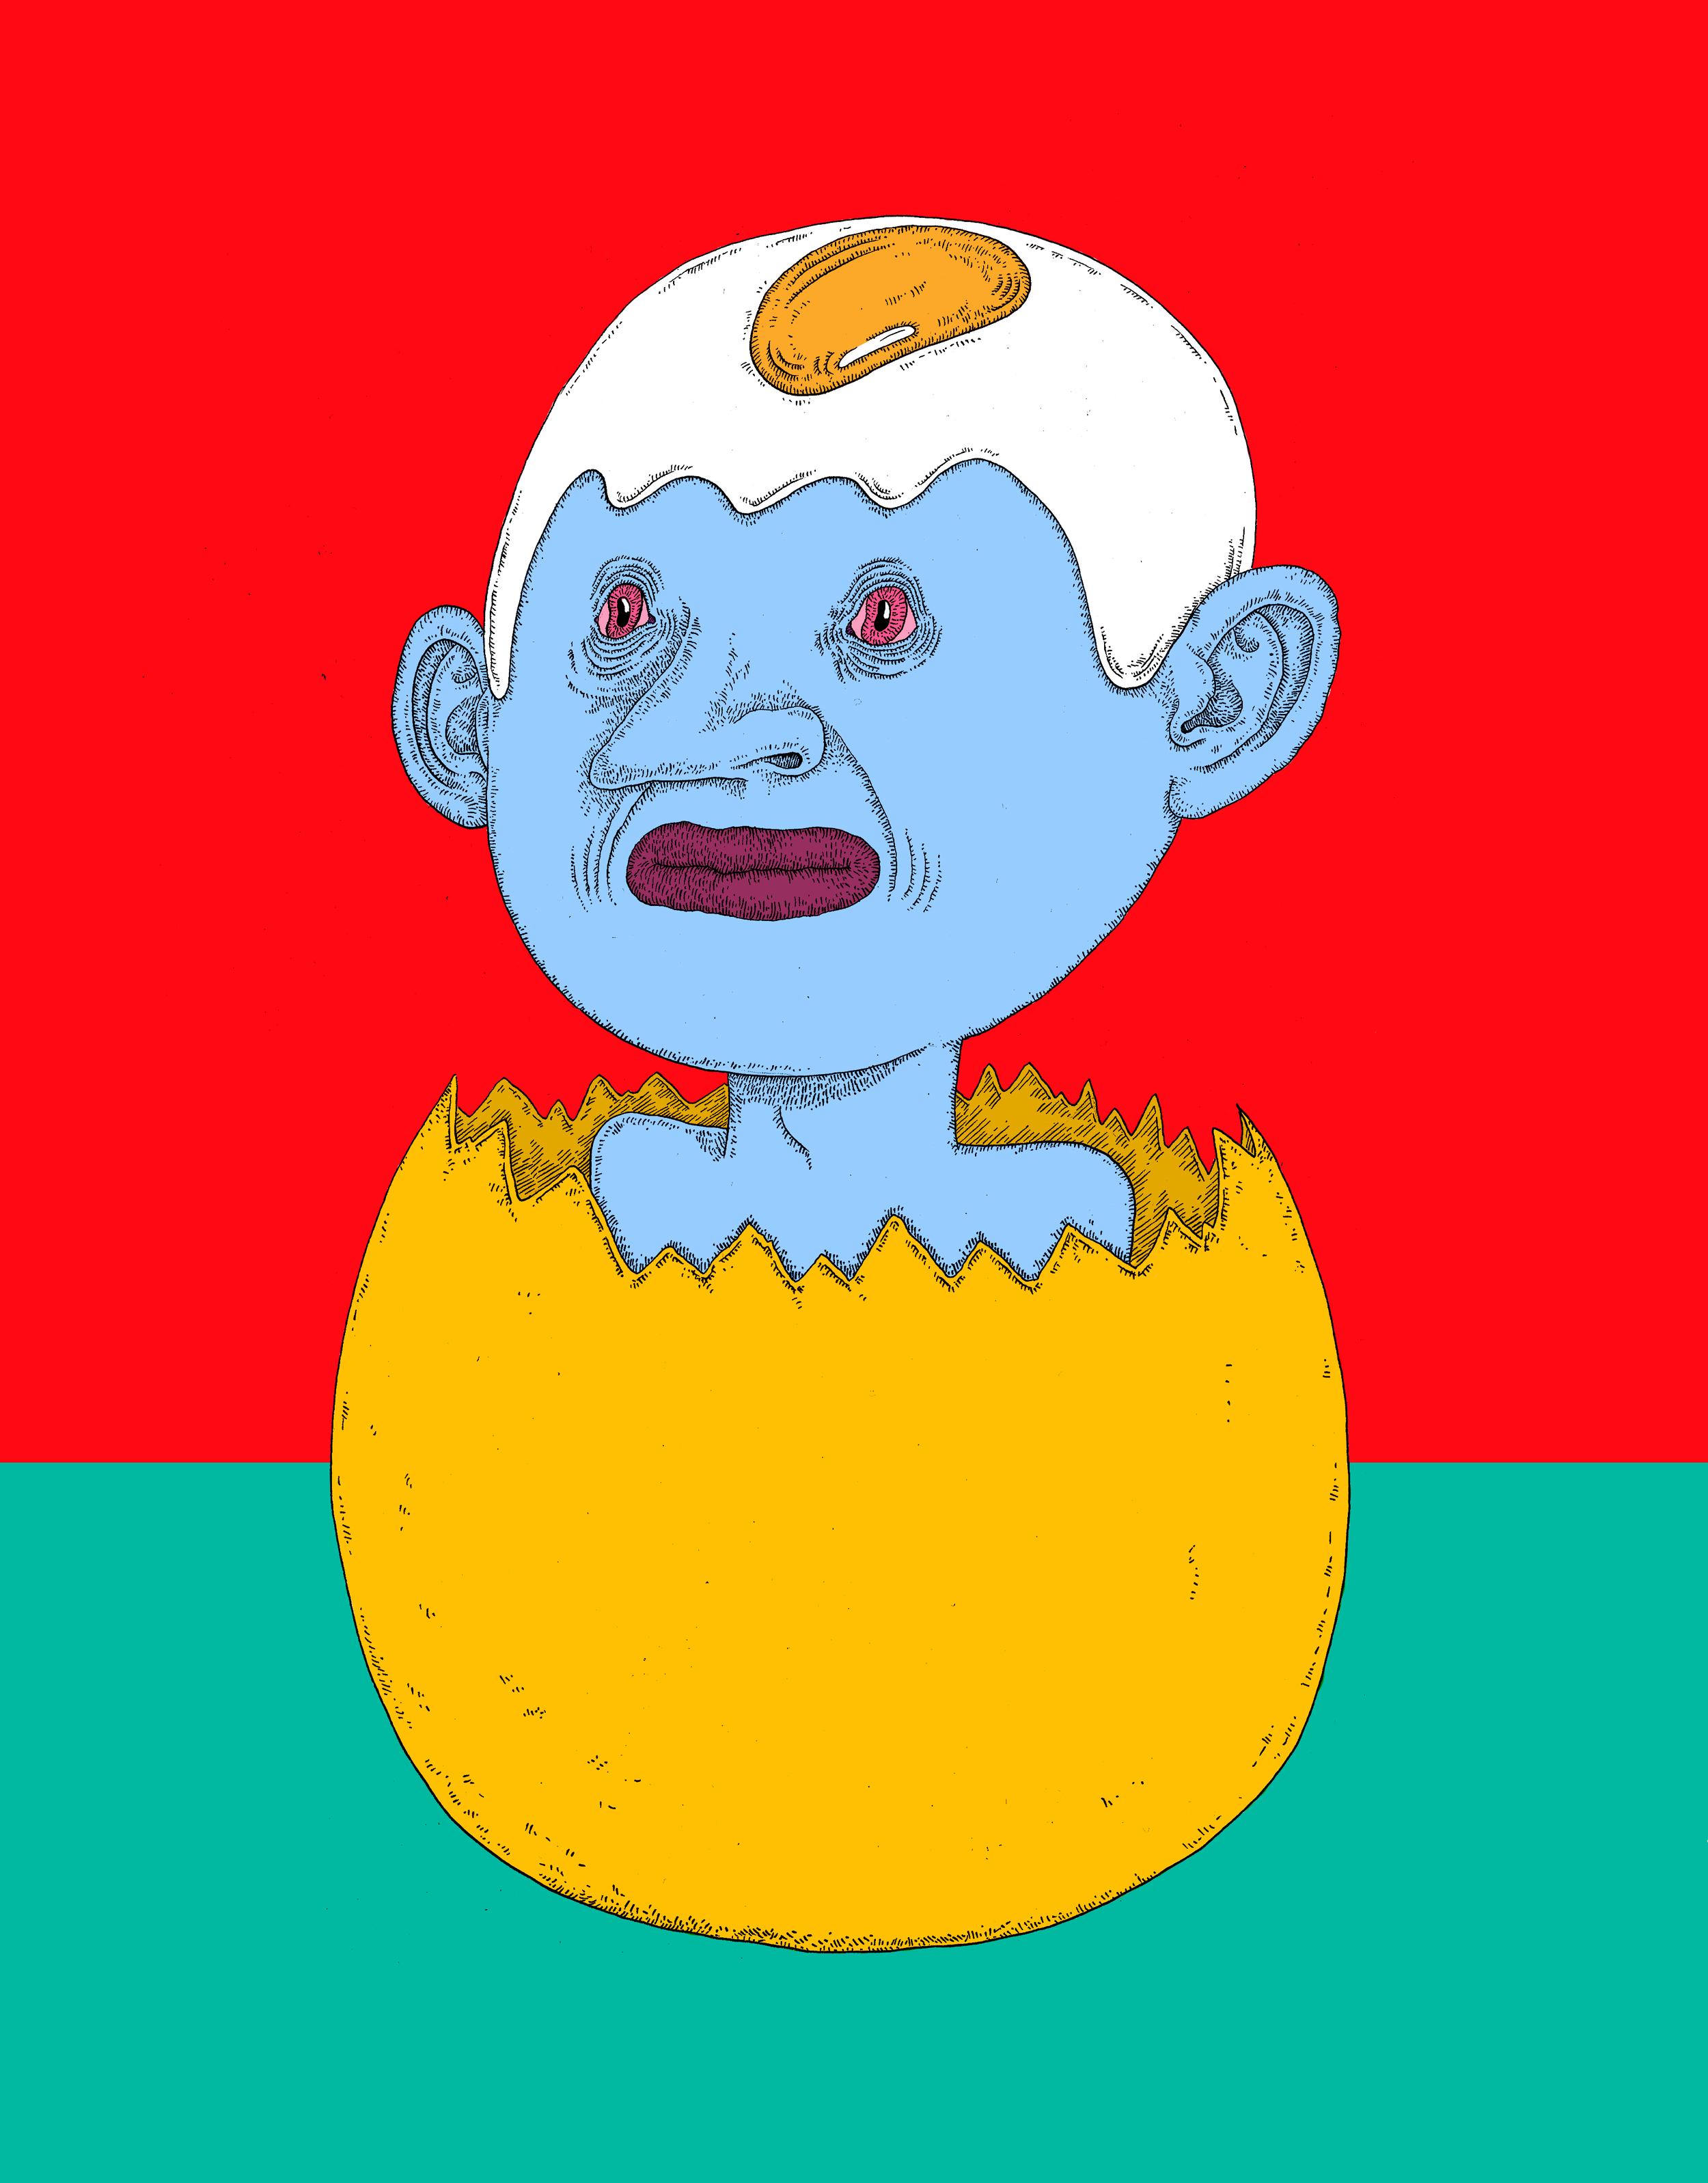 The Eggman